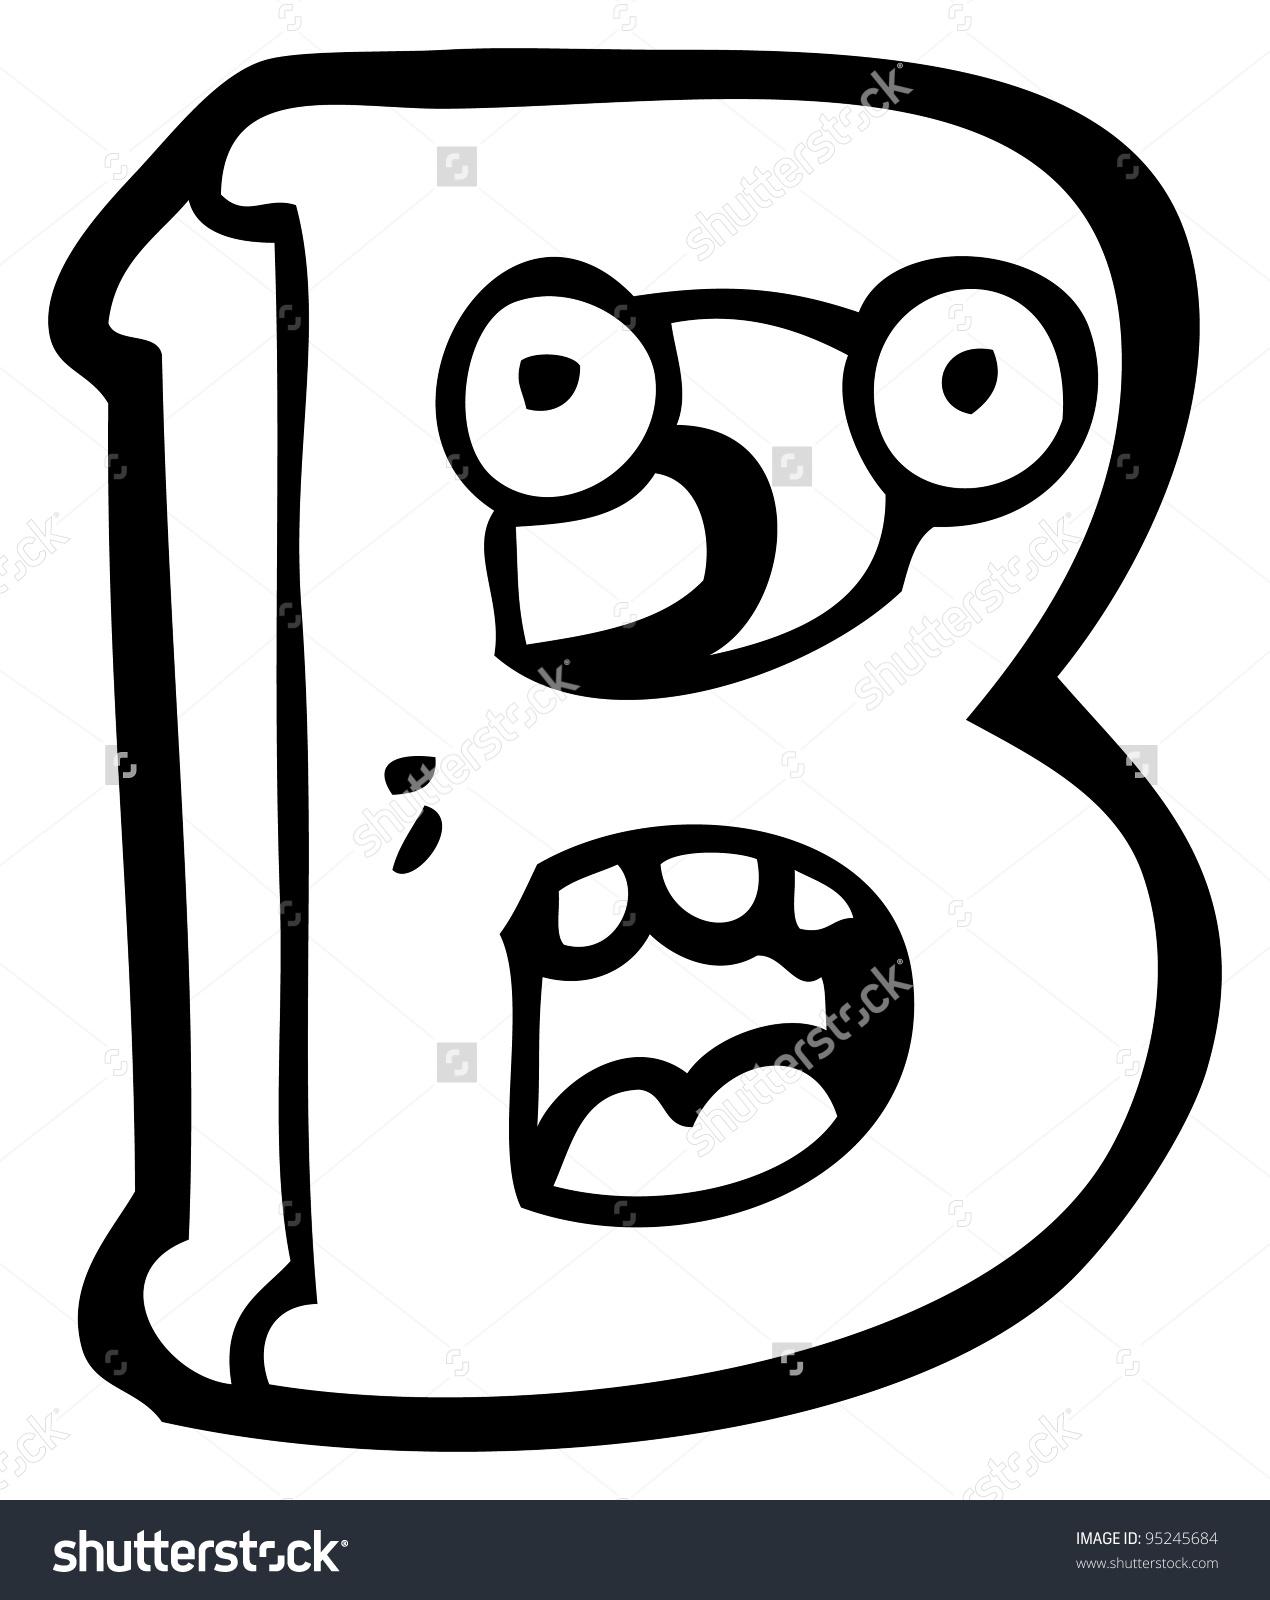 Cartoon Letter B Face Stock Illustration 95245684.